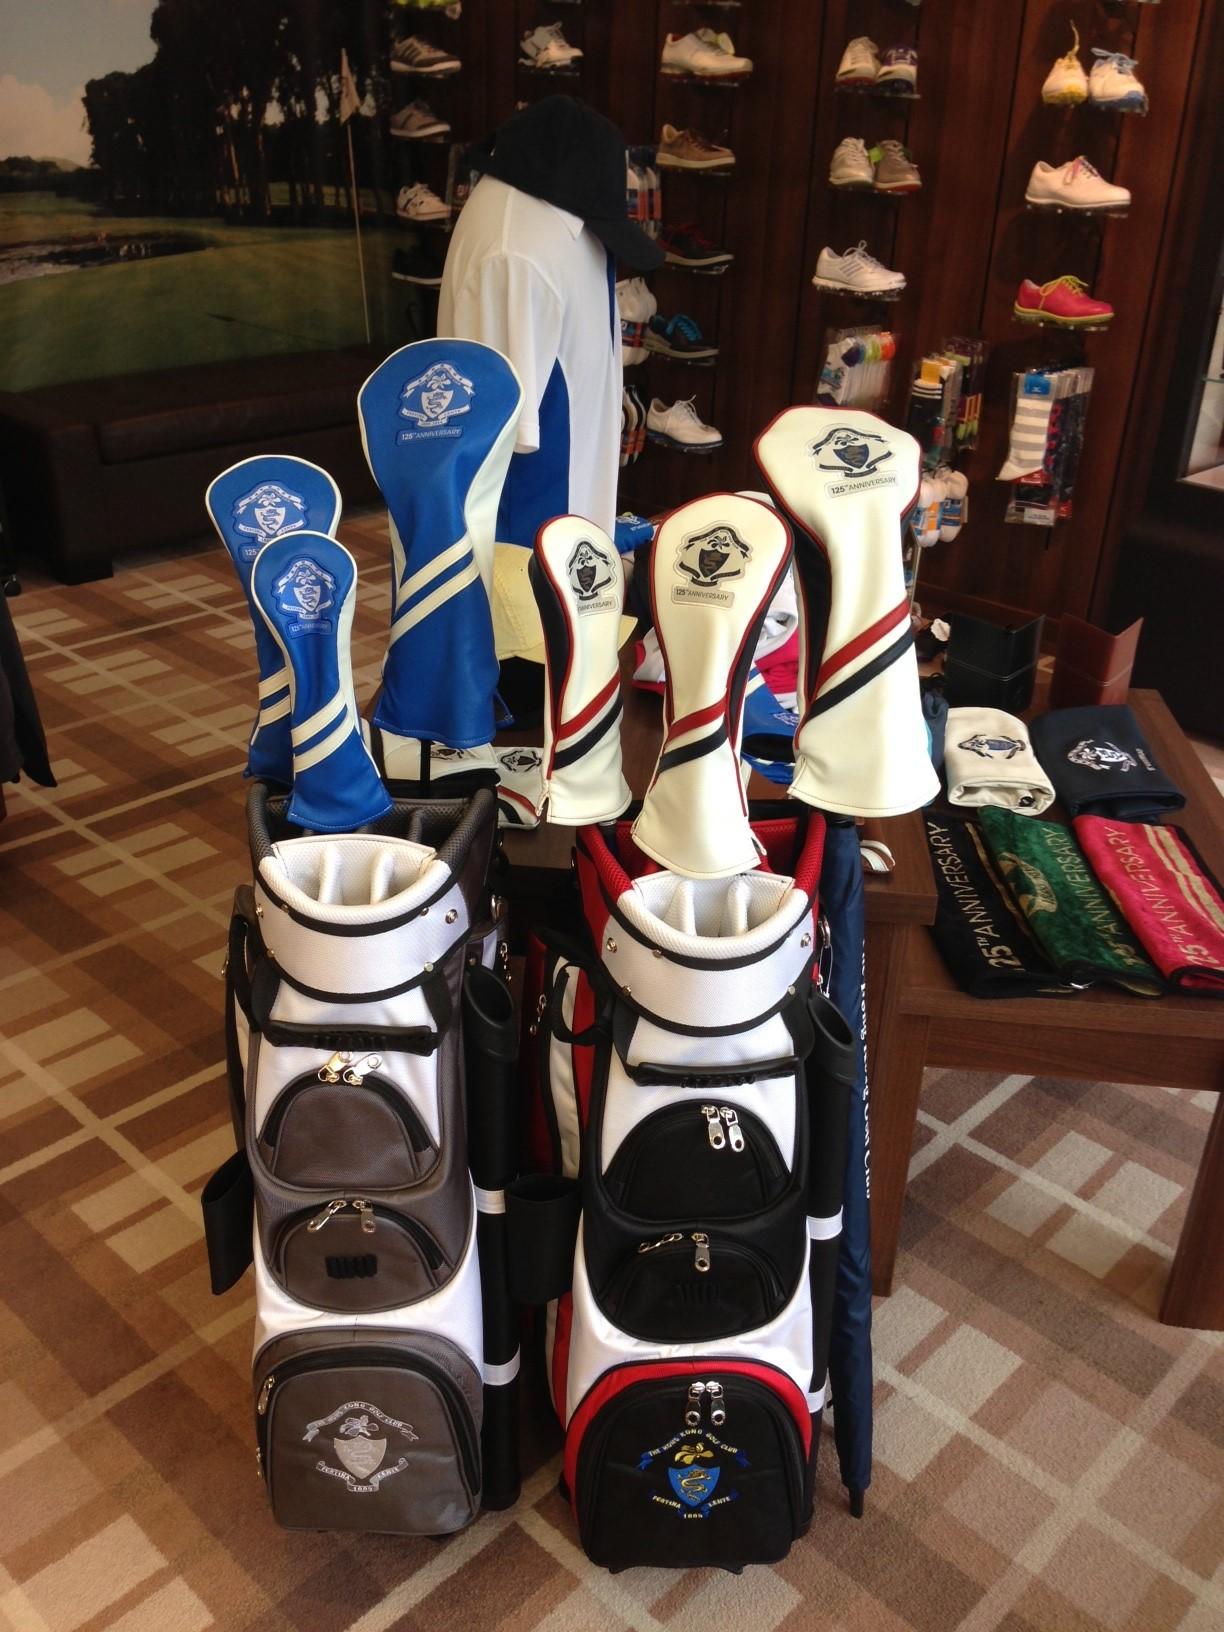 HKGC 125th Golf Bag and Headcovers display.JPG